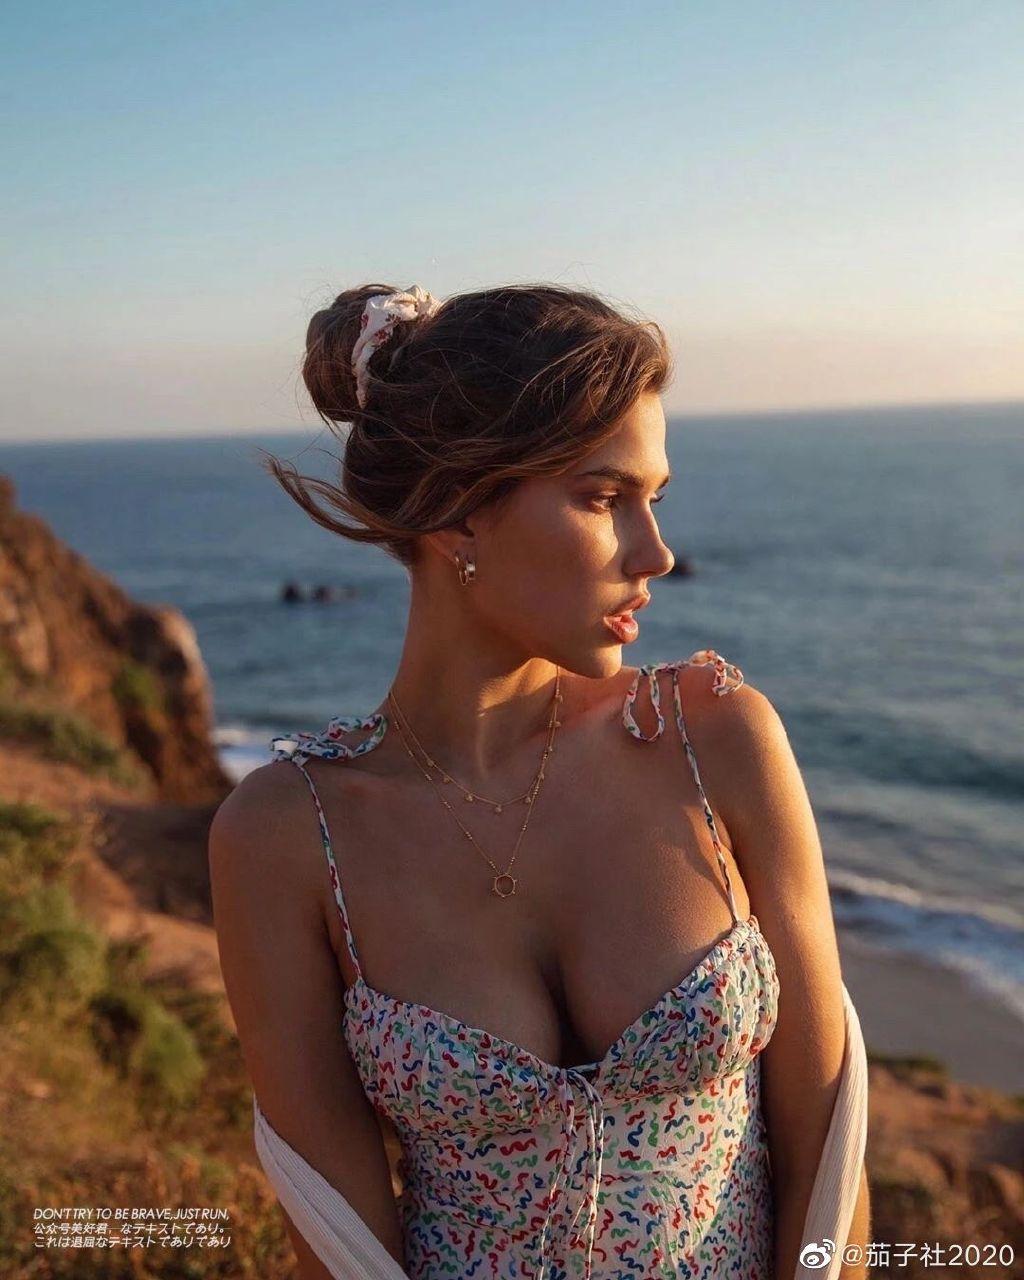 Kara Del Toro 的巨乳会不会被定义为色情低俗 涨姿势 热图5